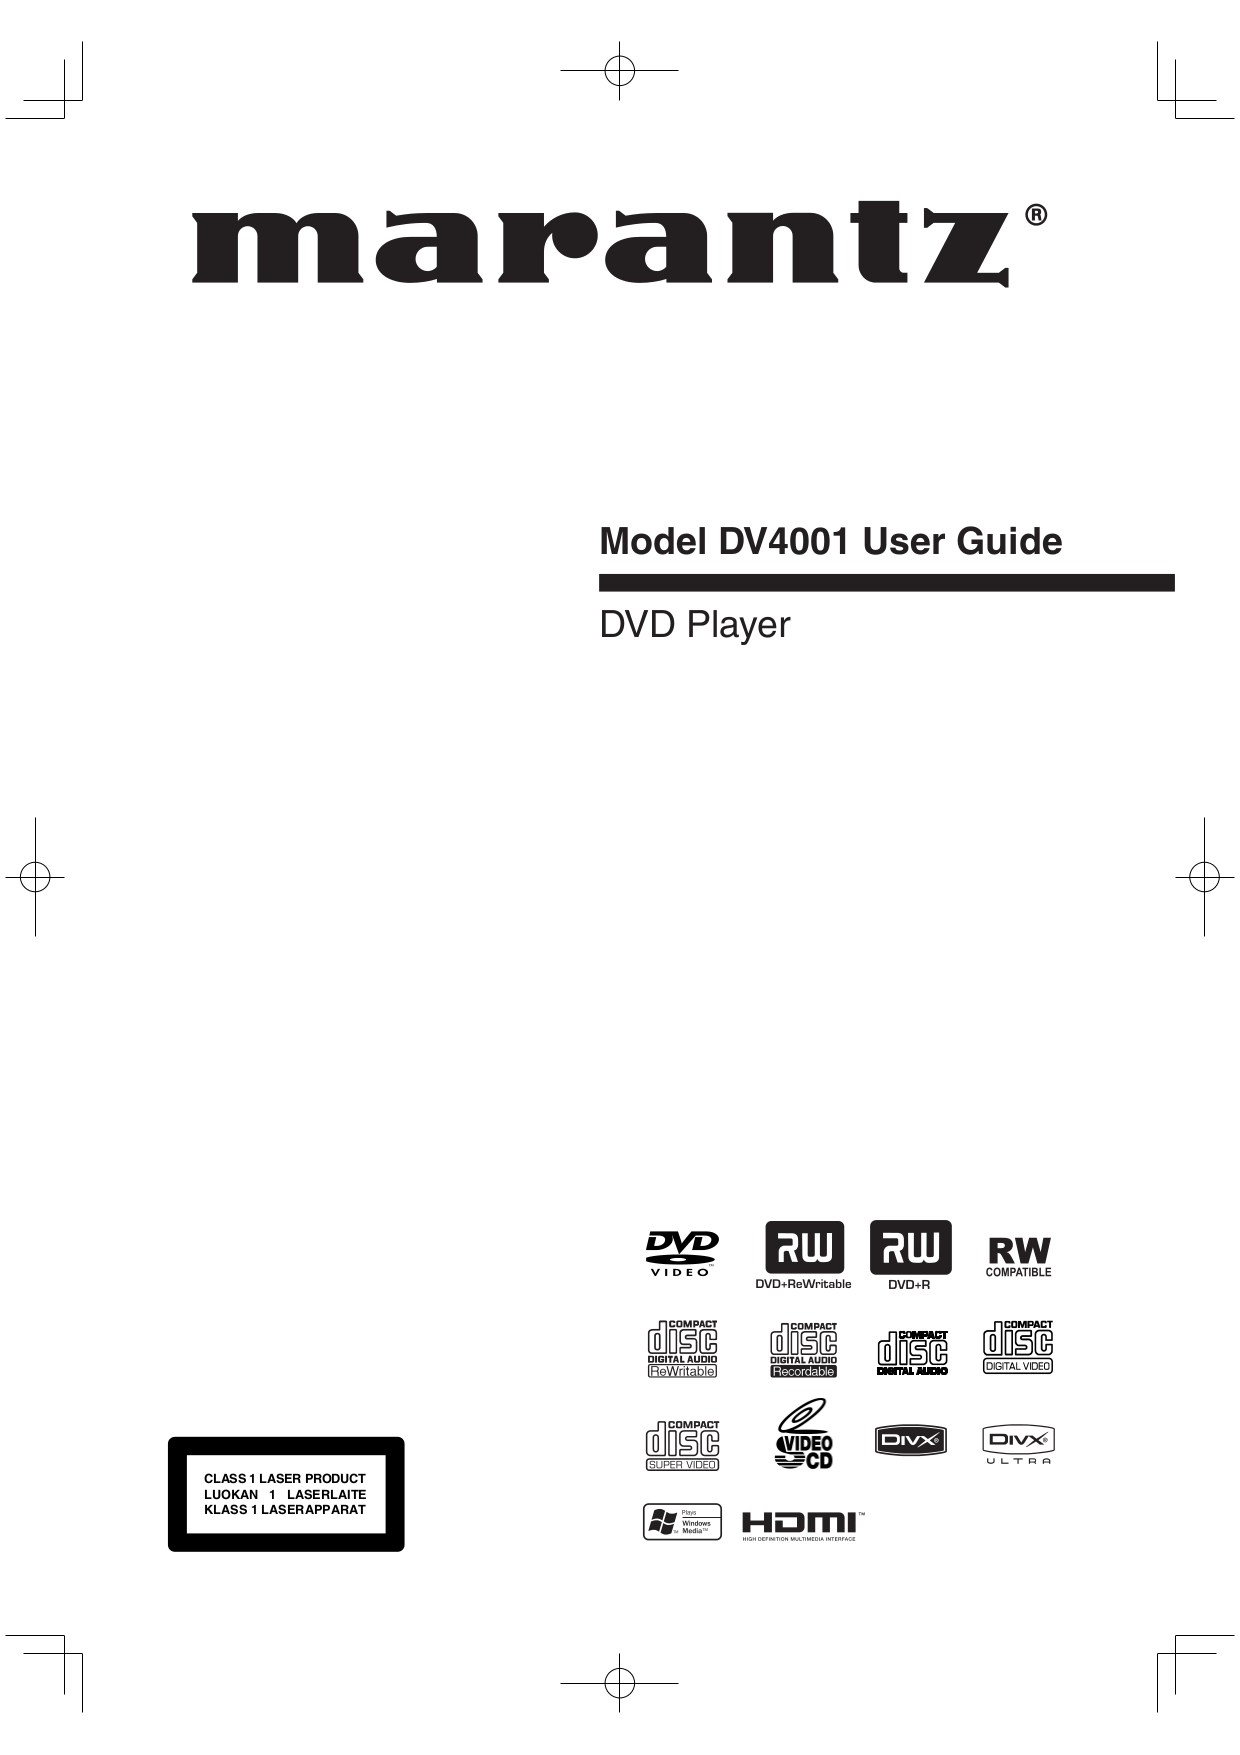 Download free pdf for Marantz DV4001 DVD Players manual